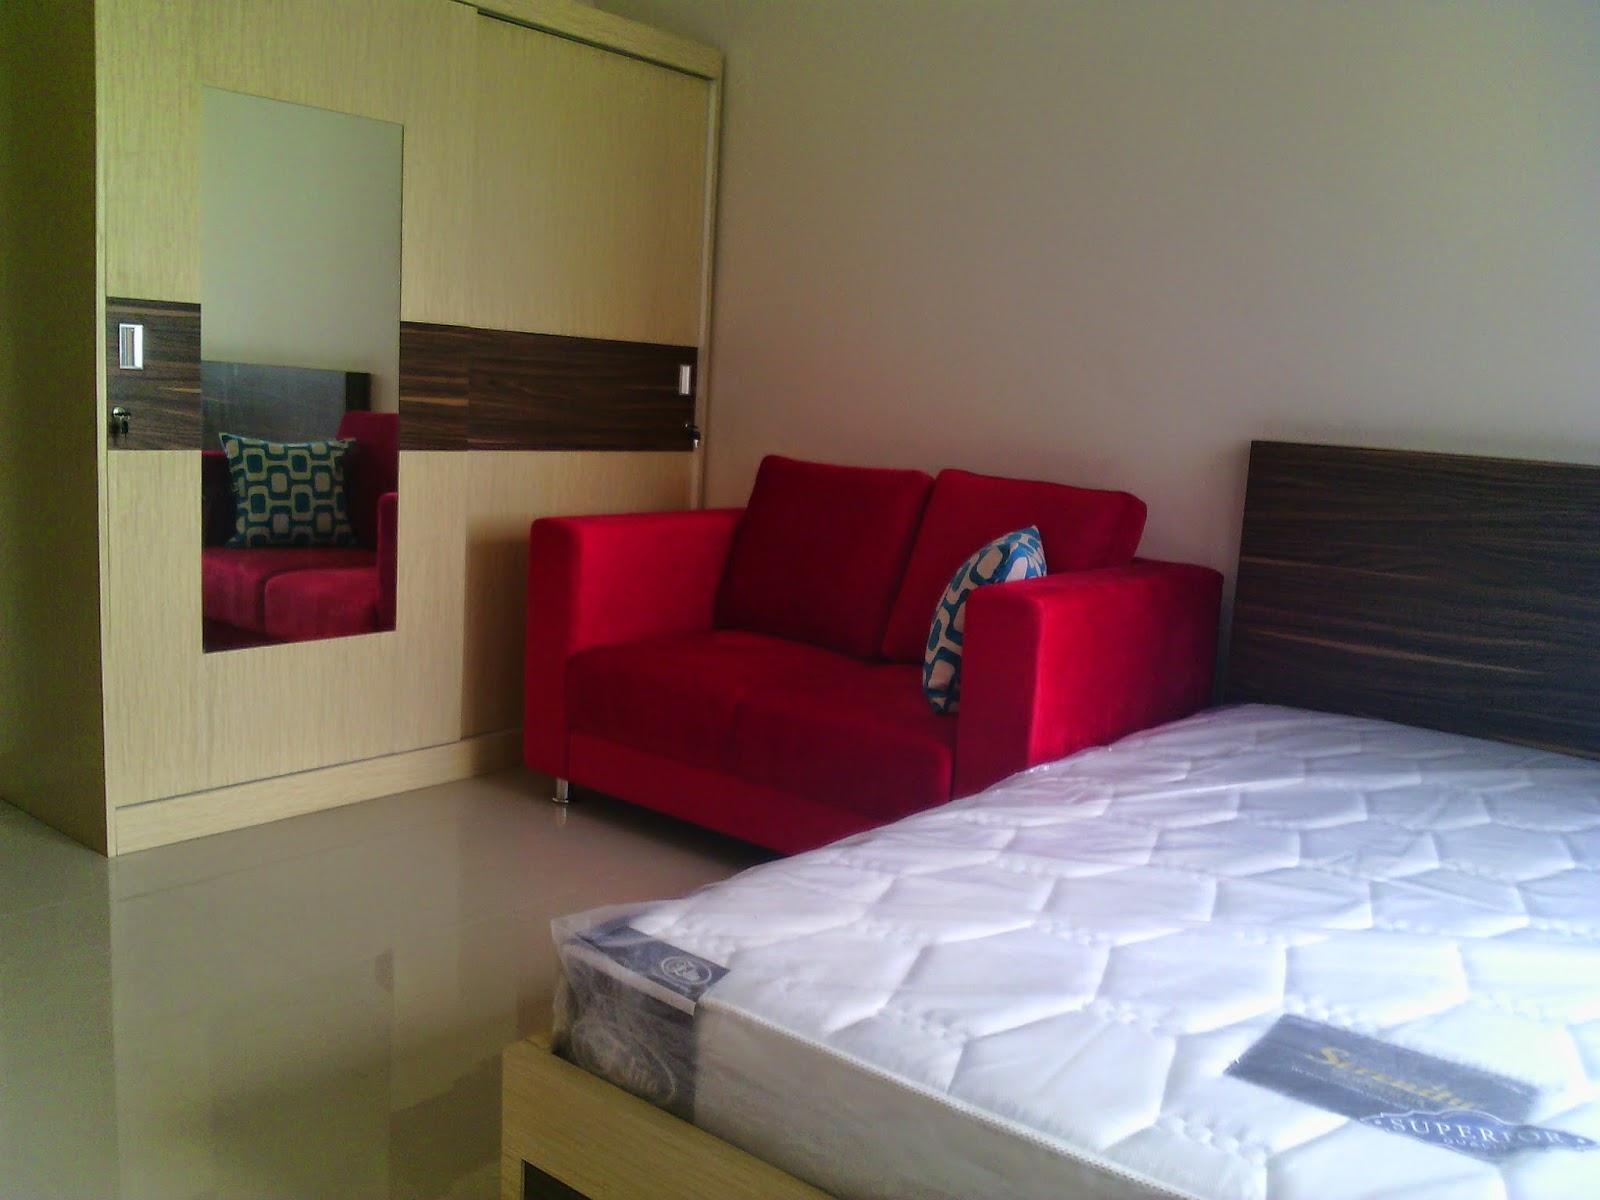 sofa studio musik bandung mid century modern sleeper wedesignstudio jasa desain interior and kontraktor